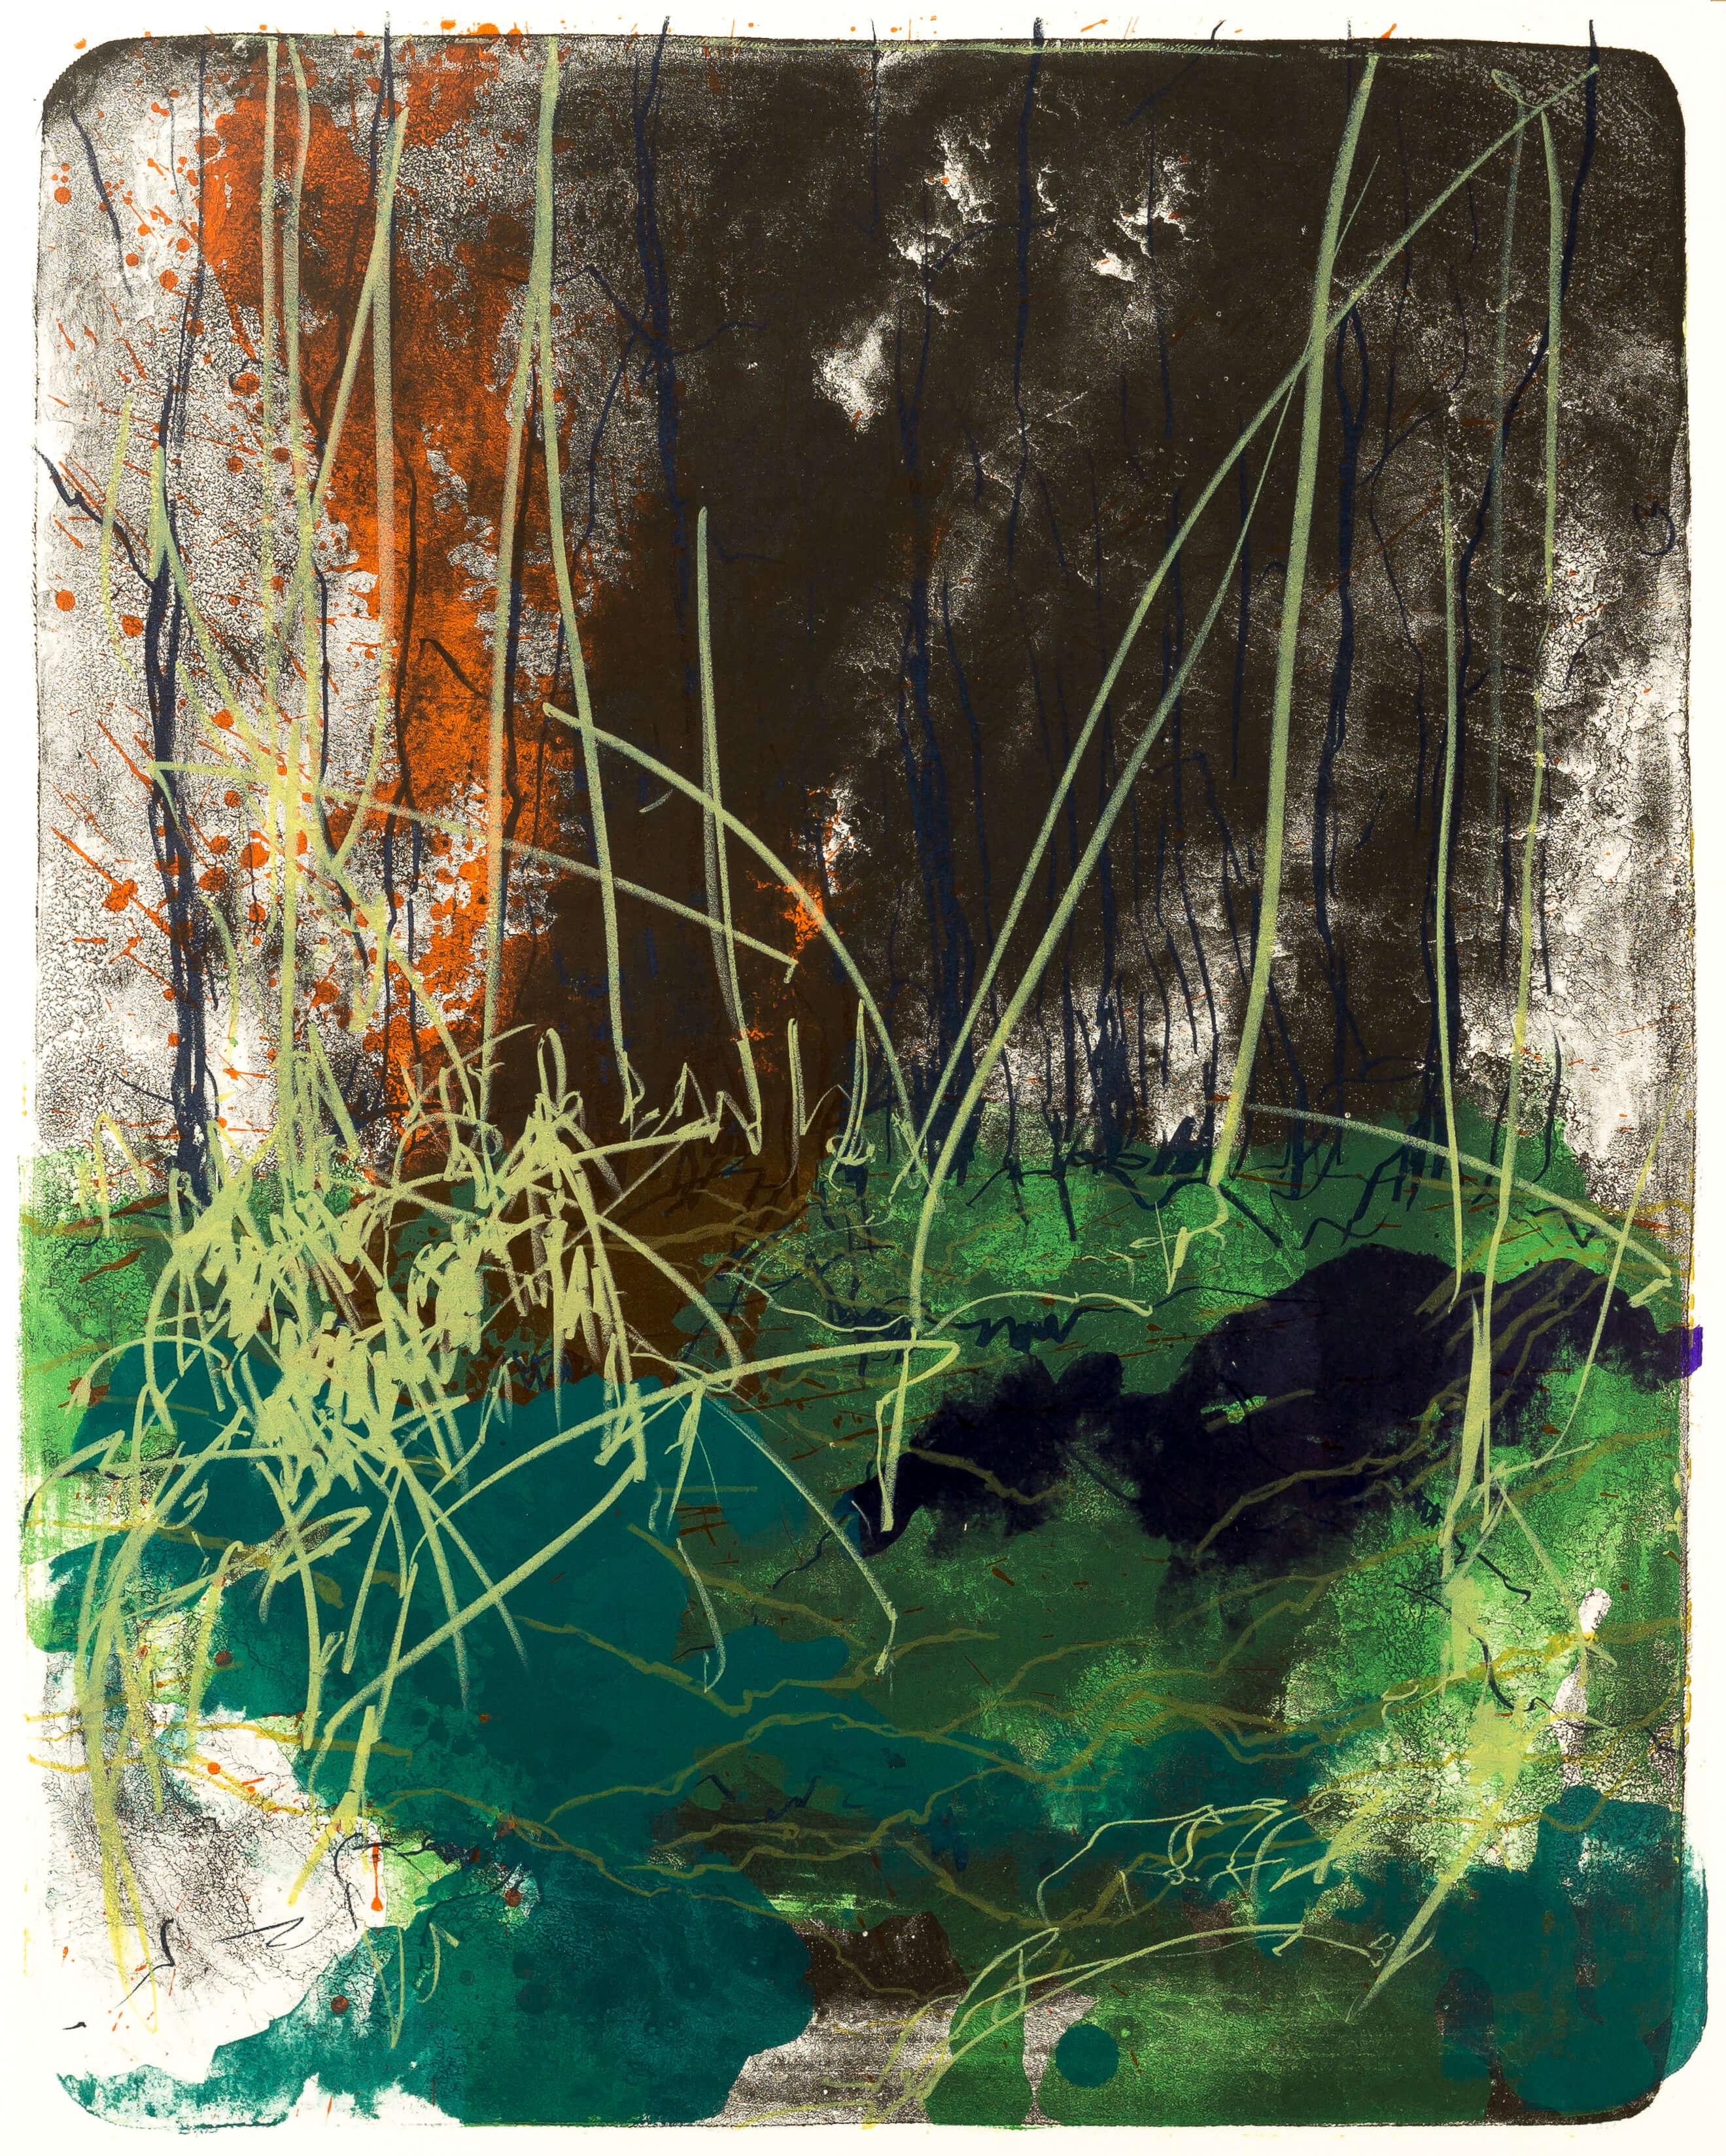 Katharina Albers, Wald X(N)-IV, 2015, Farblithographie, Unikat 50x40 cm